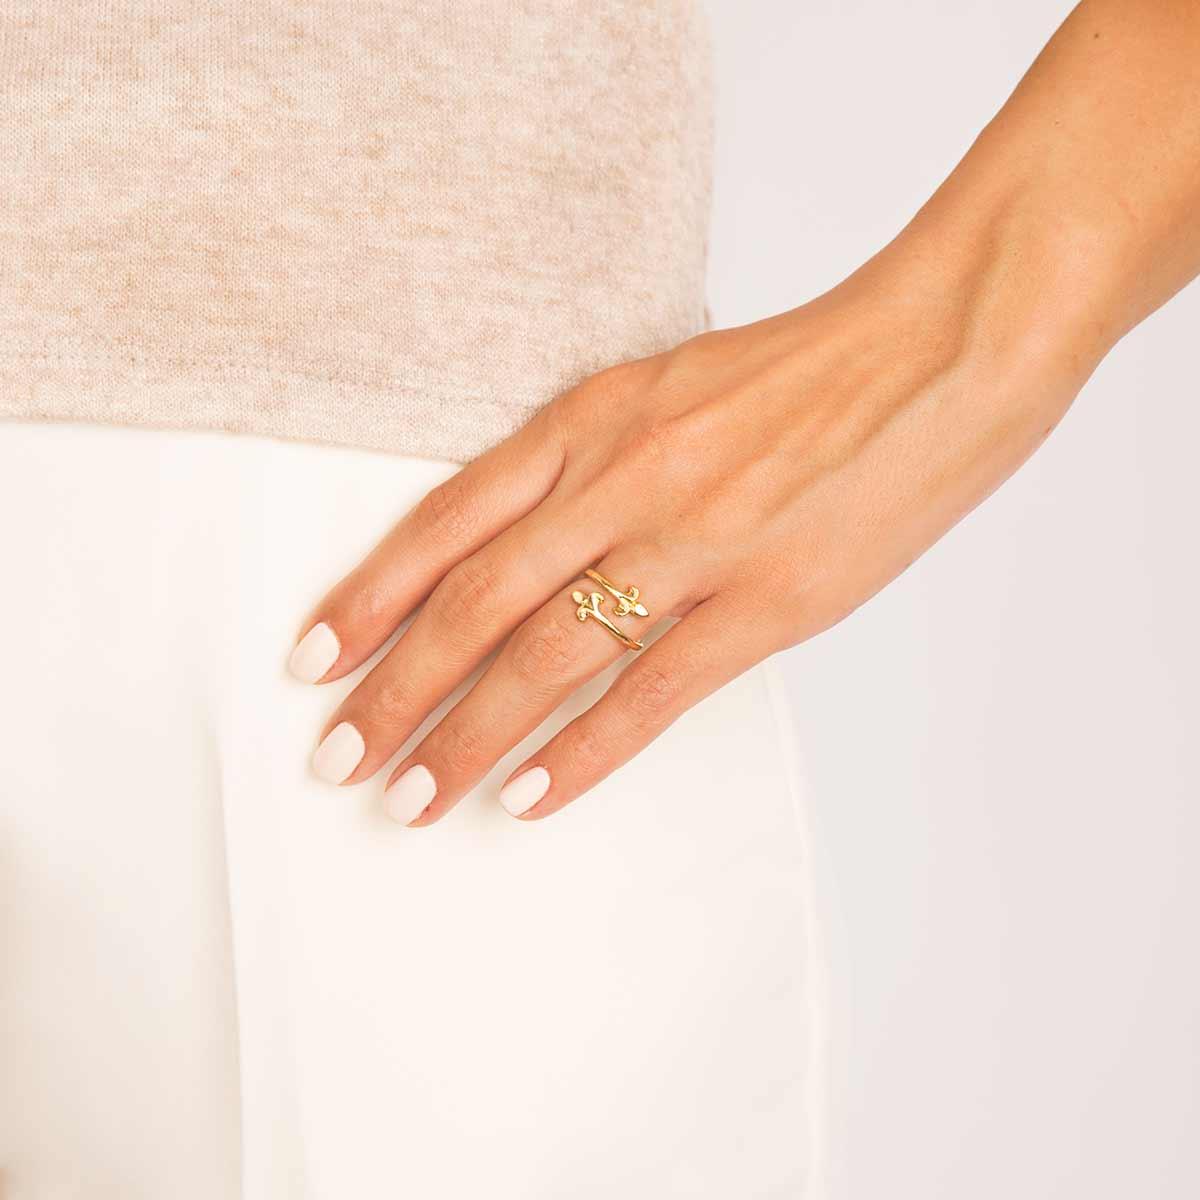 انگشتر طلا خنجر کوچک